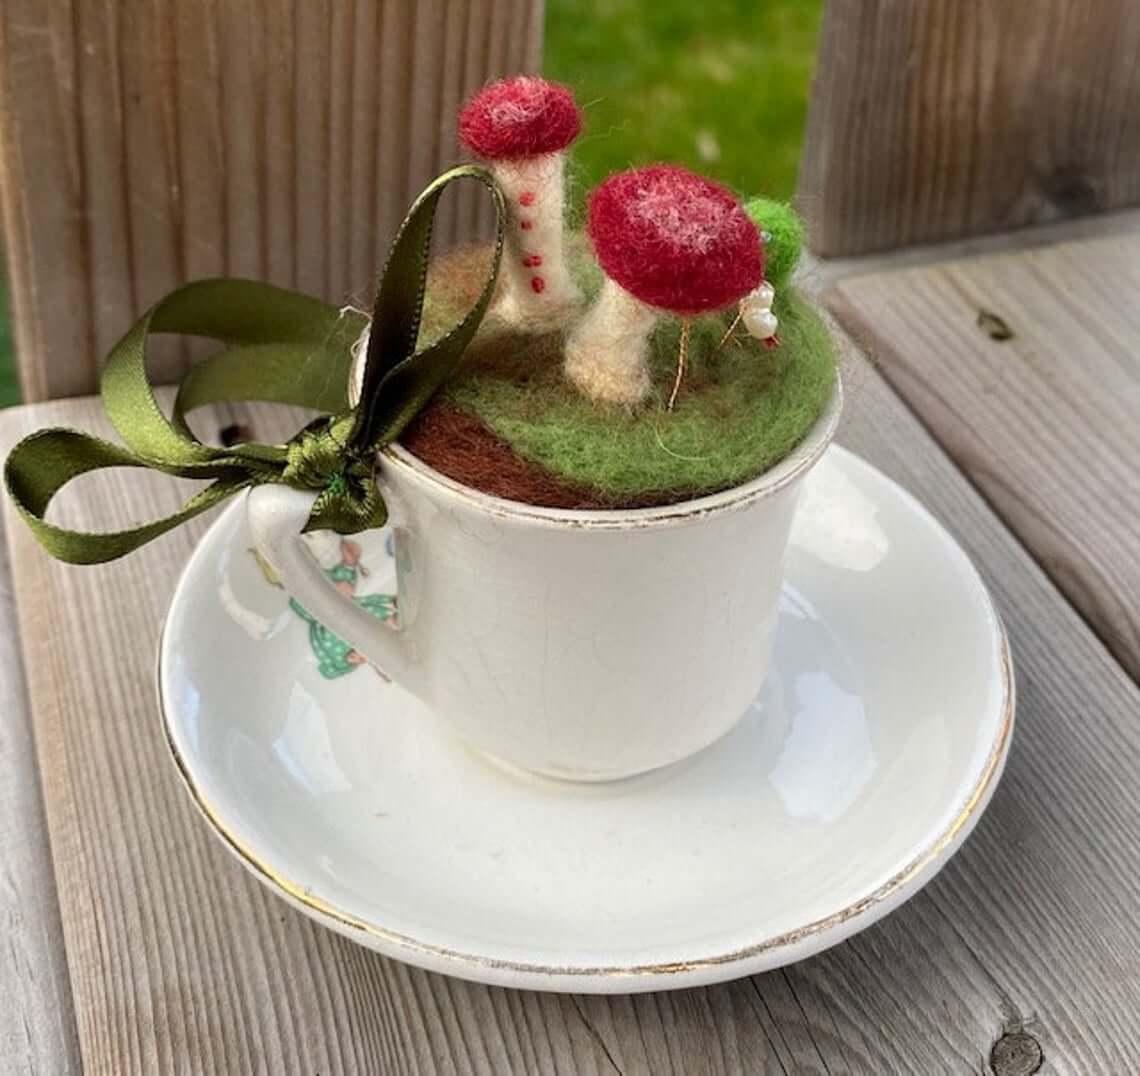 Fuzzy Mushroom Decorative Teacup and Saucer